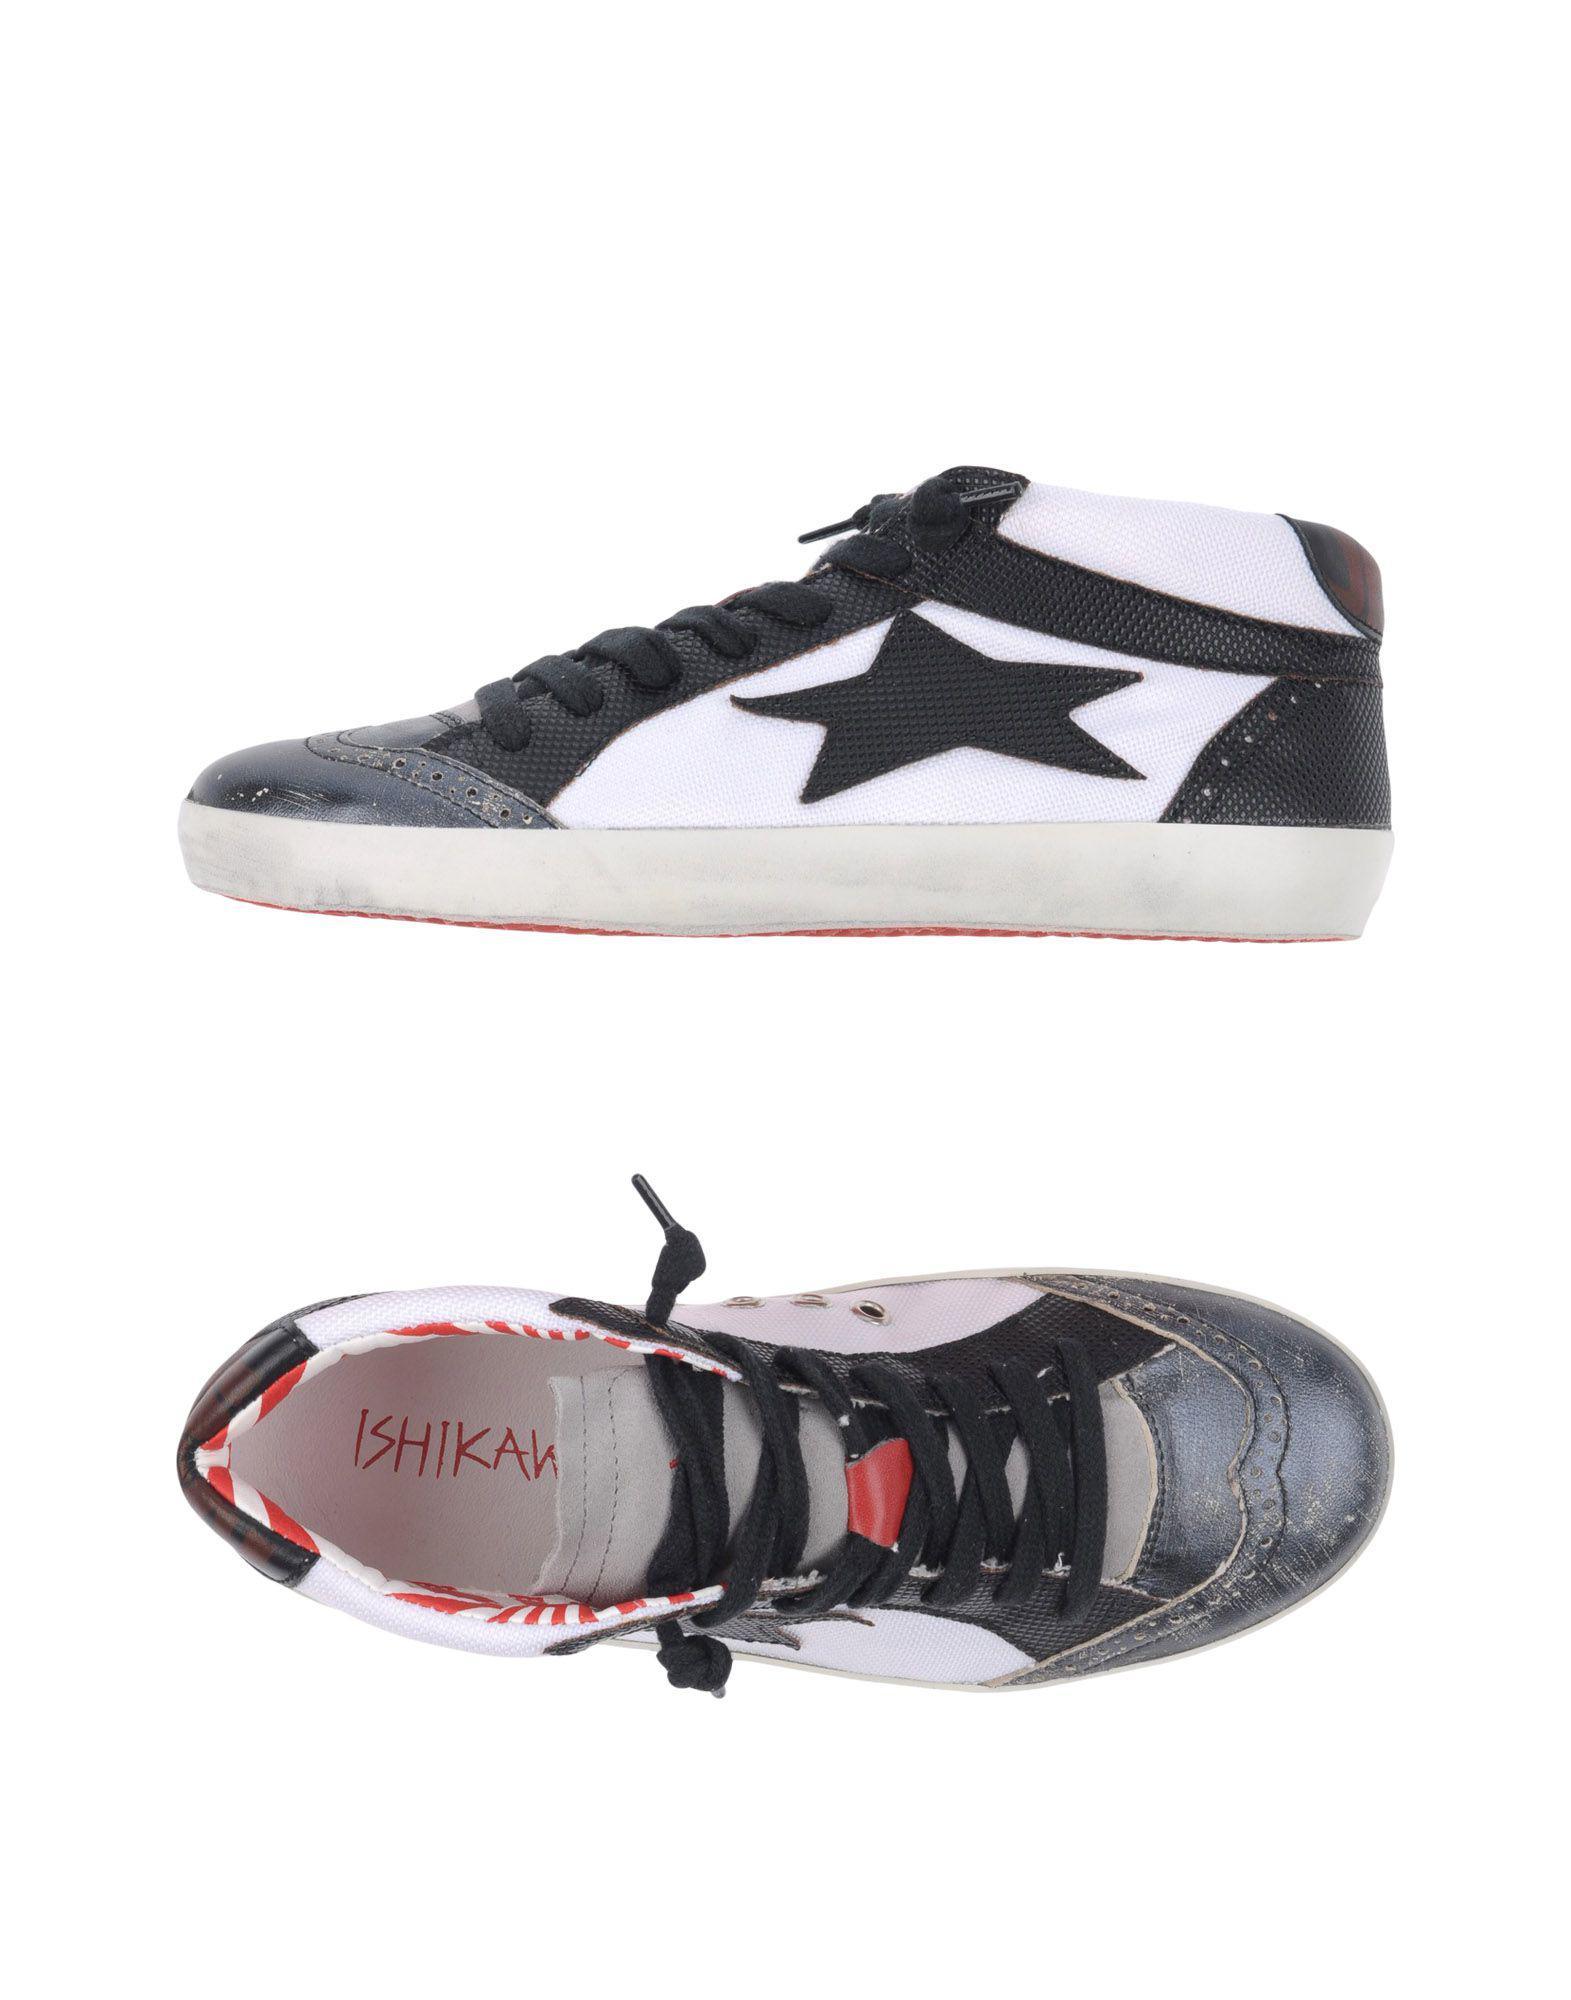 Ishikawa. Women's Black High-tops & Sneakers